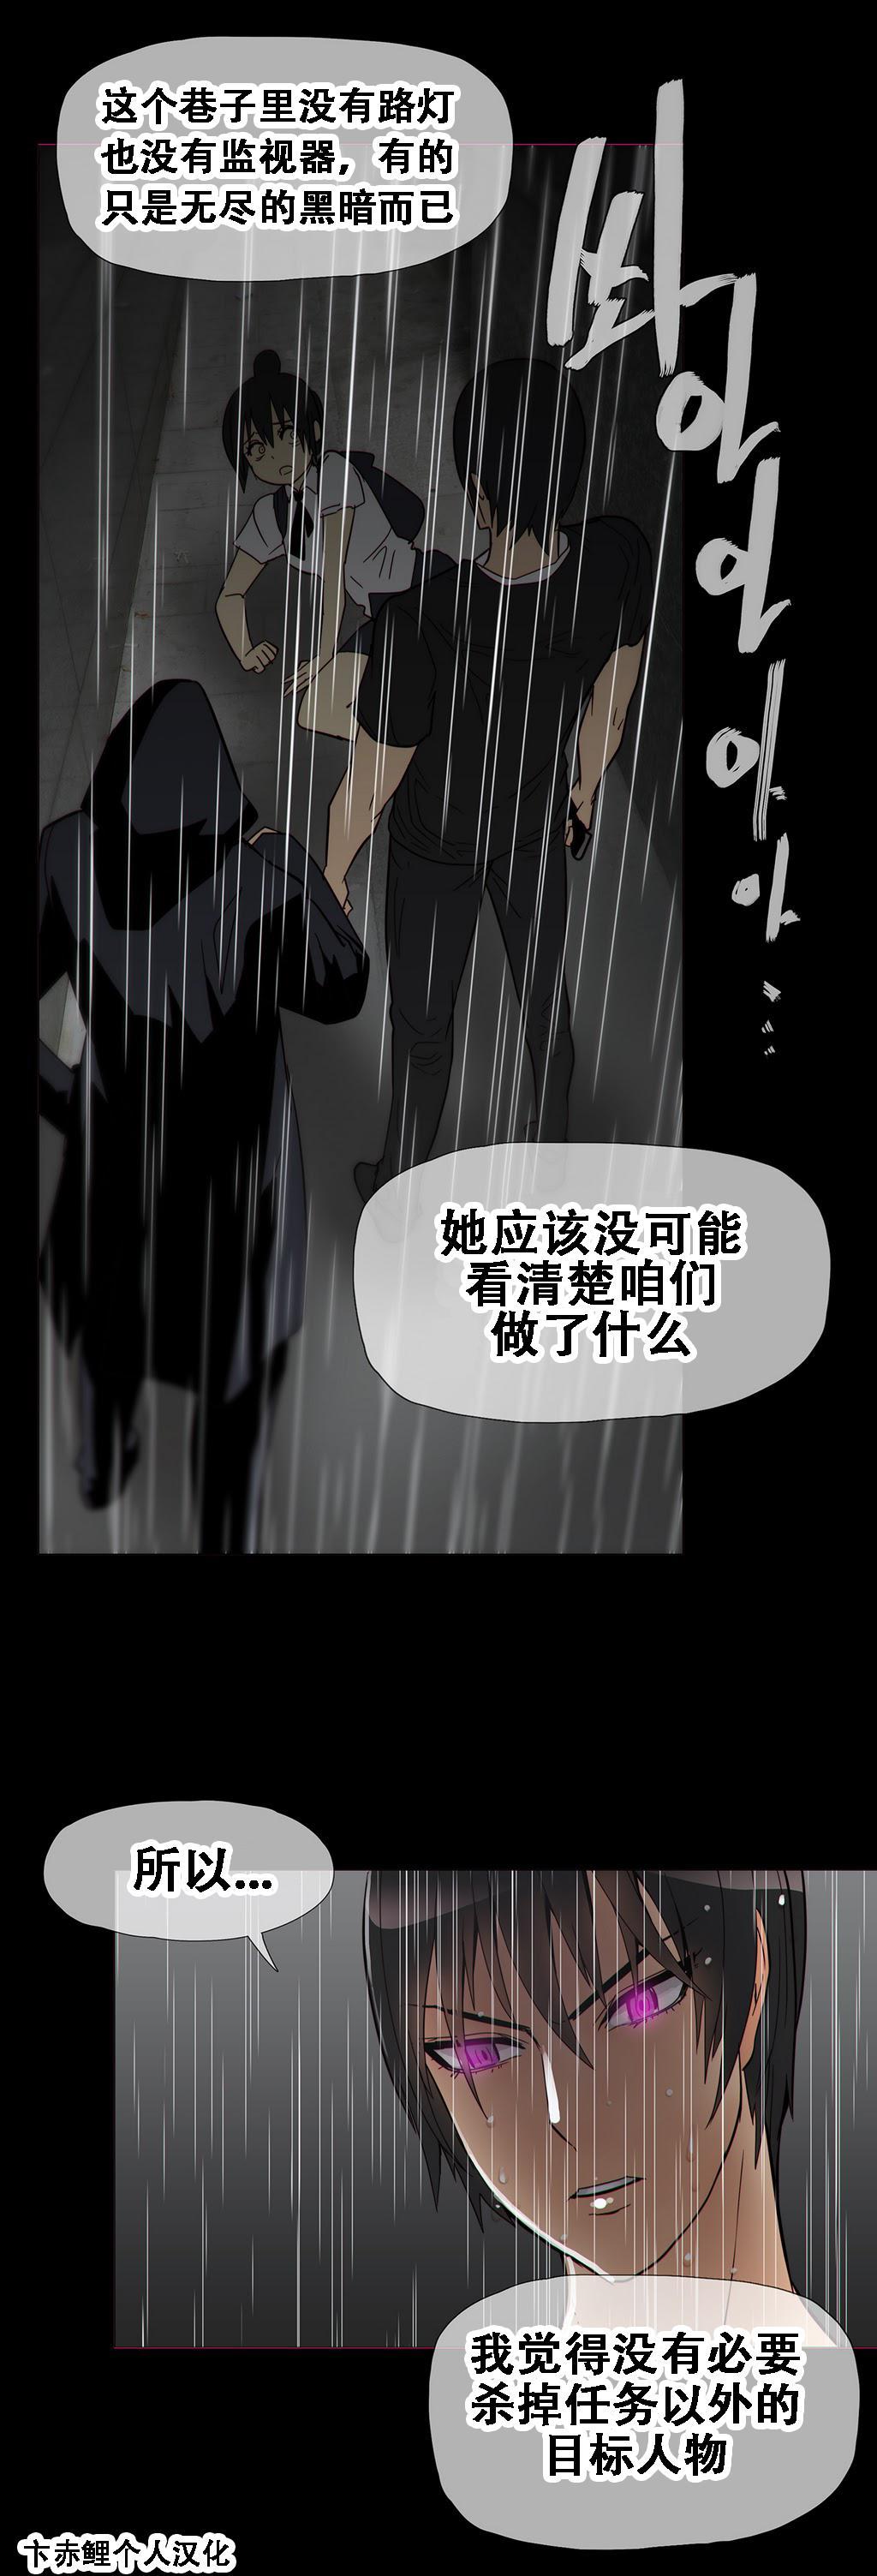 HouseHold Affairs 【卞赤鲤汉化】1~15话 333